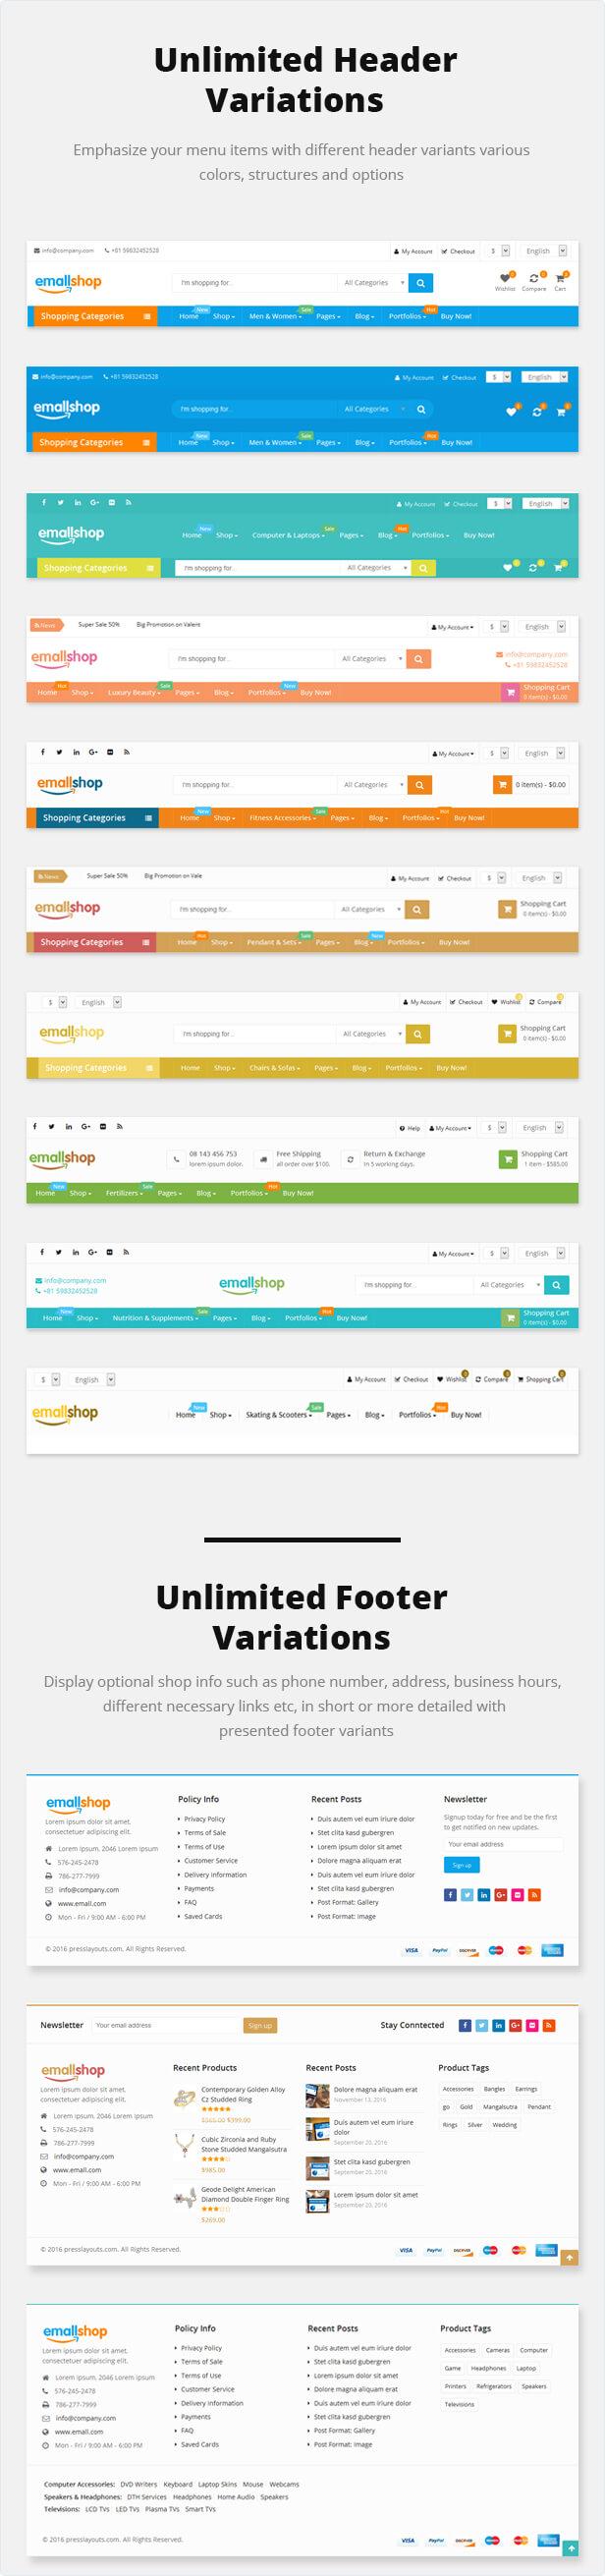 EmallShop - موضوع WooCommerce WordPress سريع الاستجابة 12